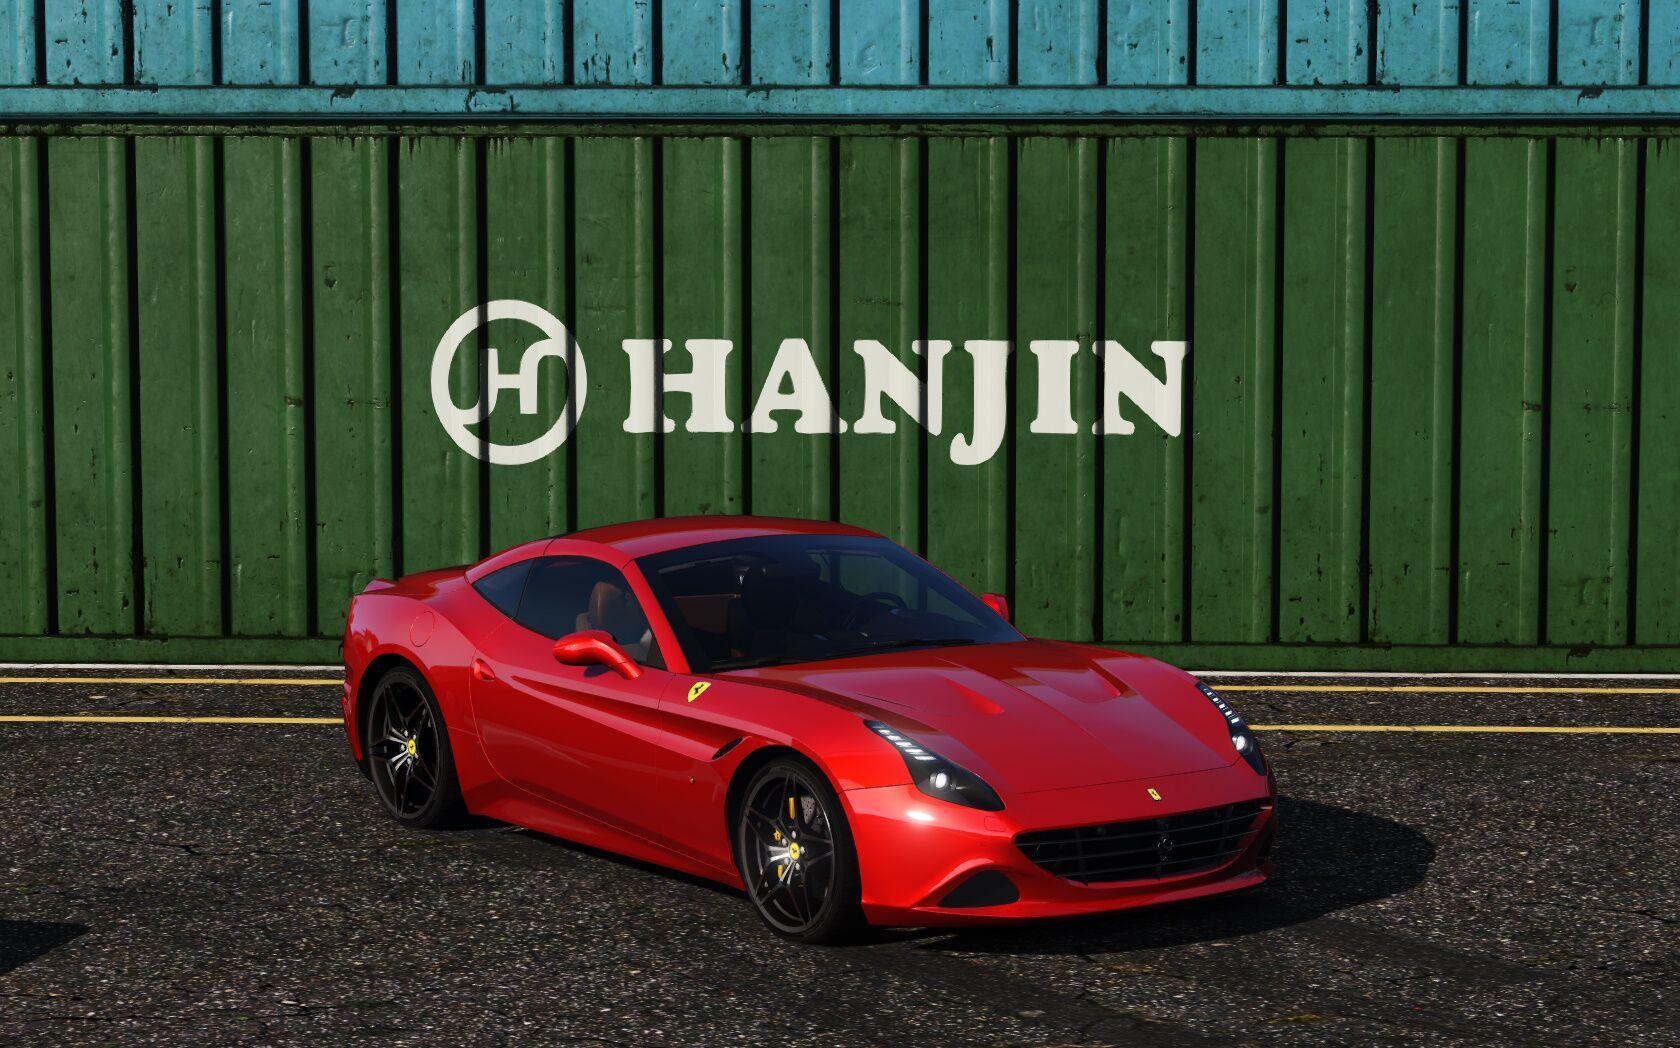 2015 Ferrari California TAutomatic Convertible - GTA5 ...